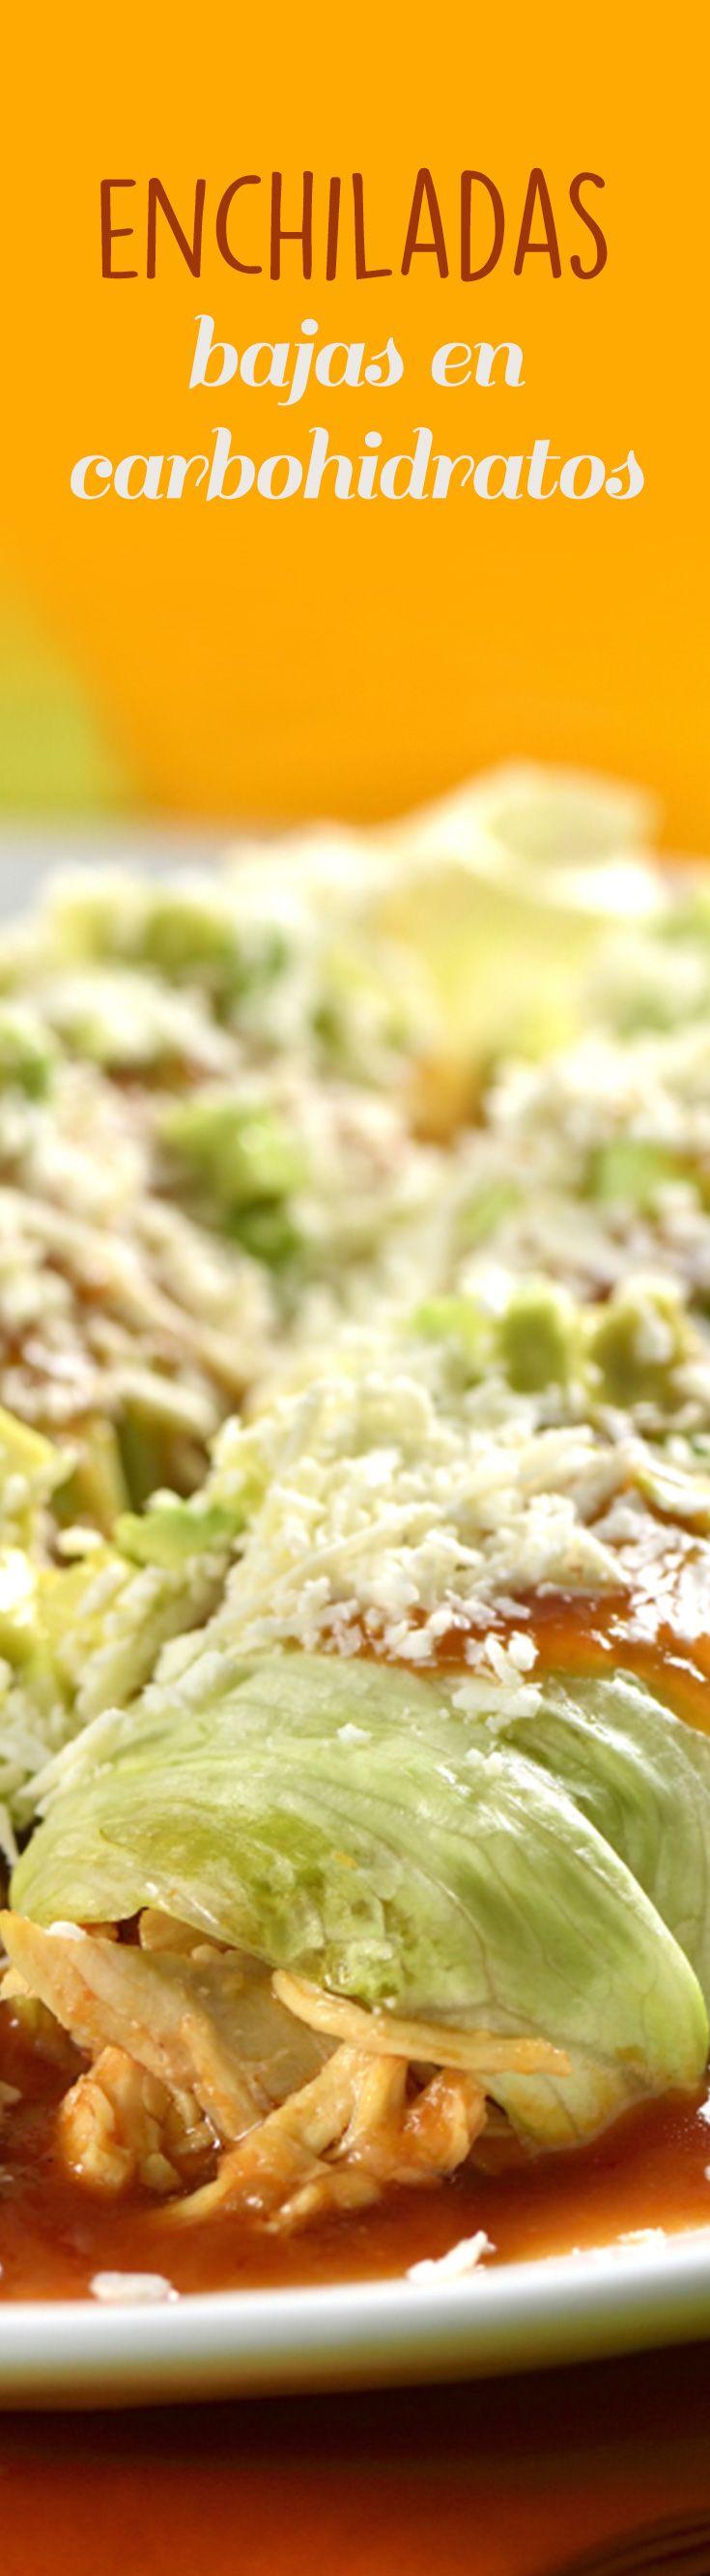 1000+ images about Recetas de cocina | Cooking Recipes on